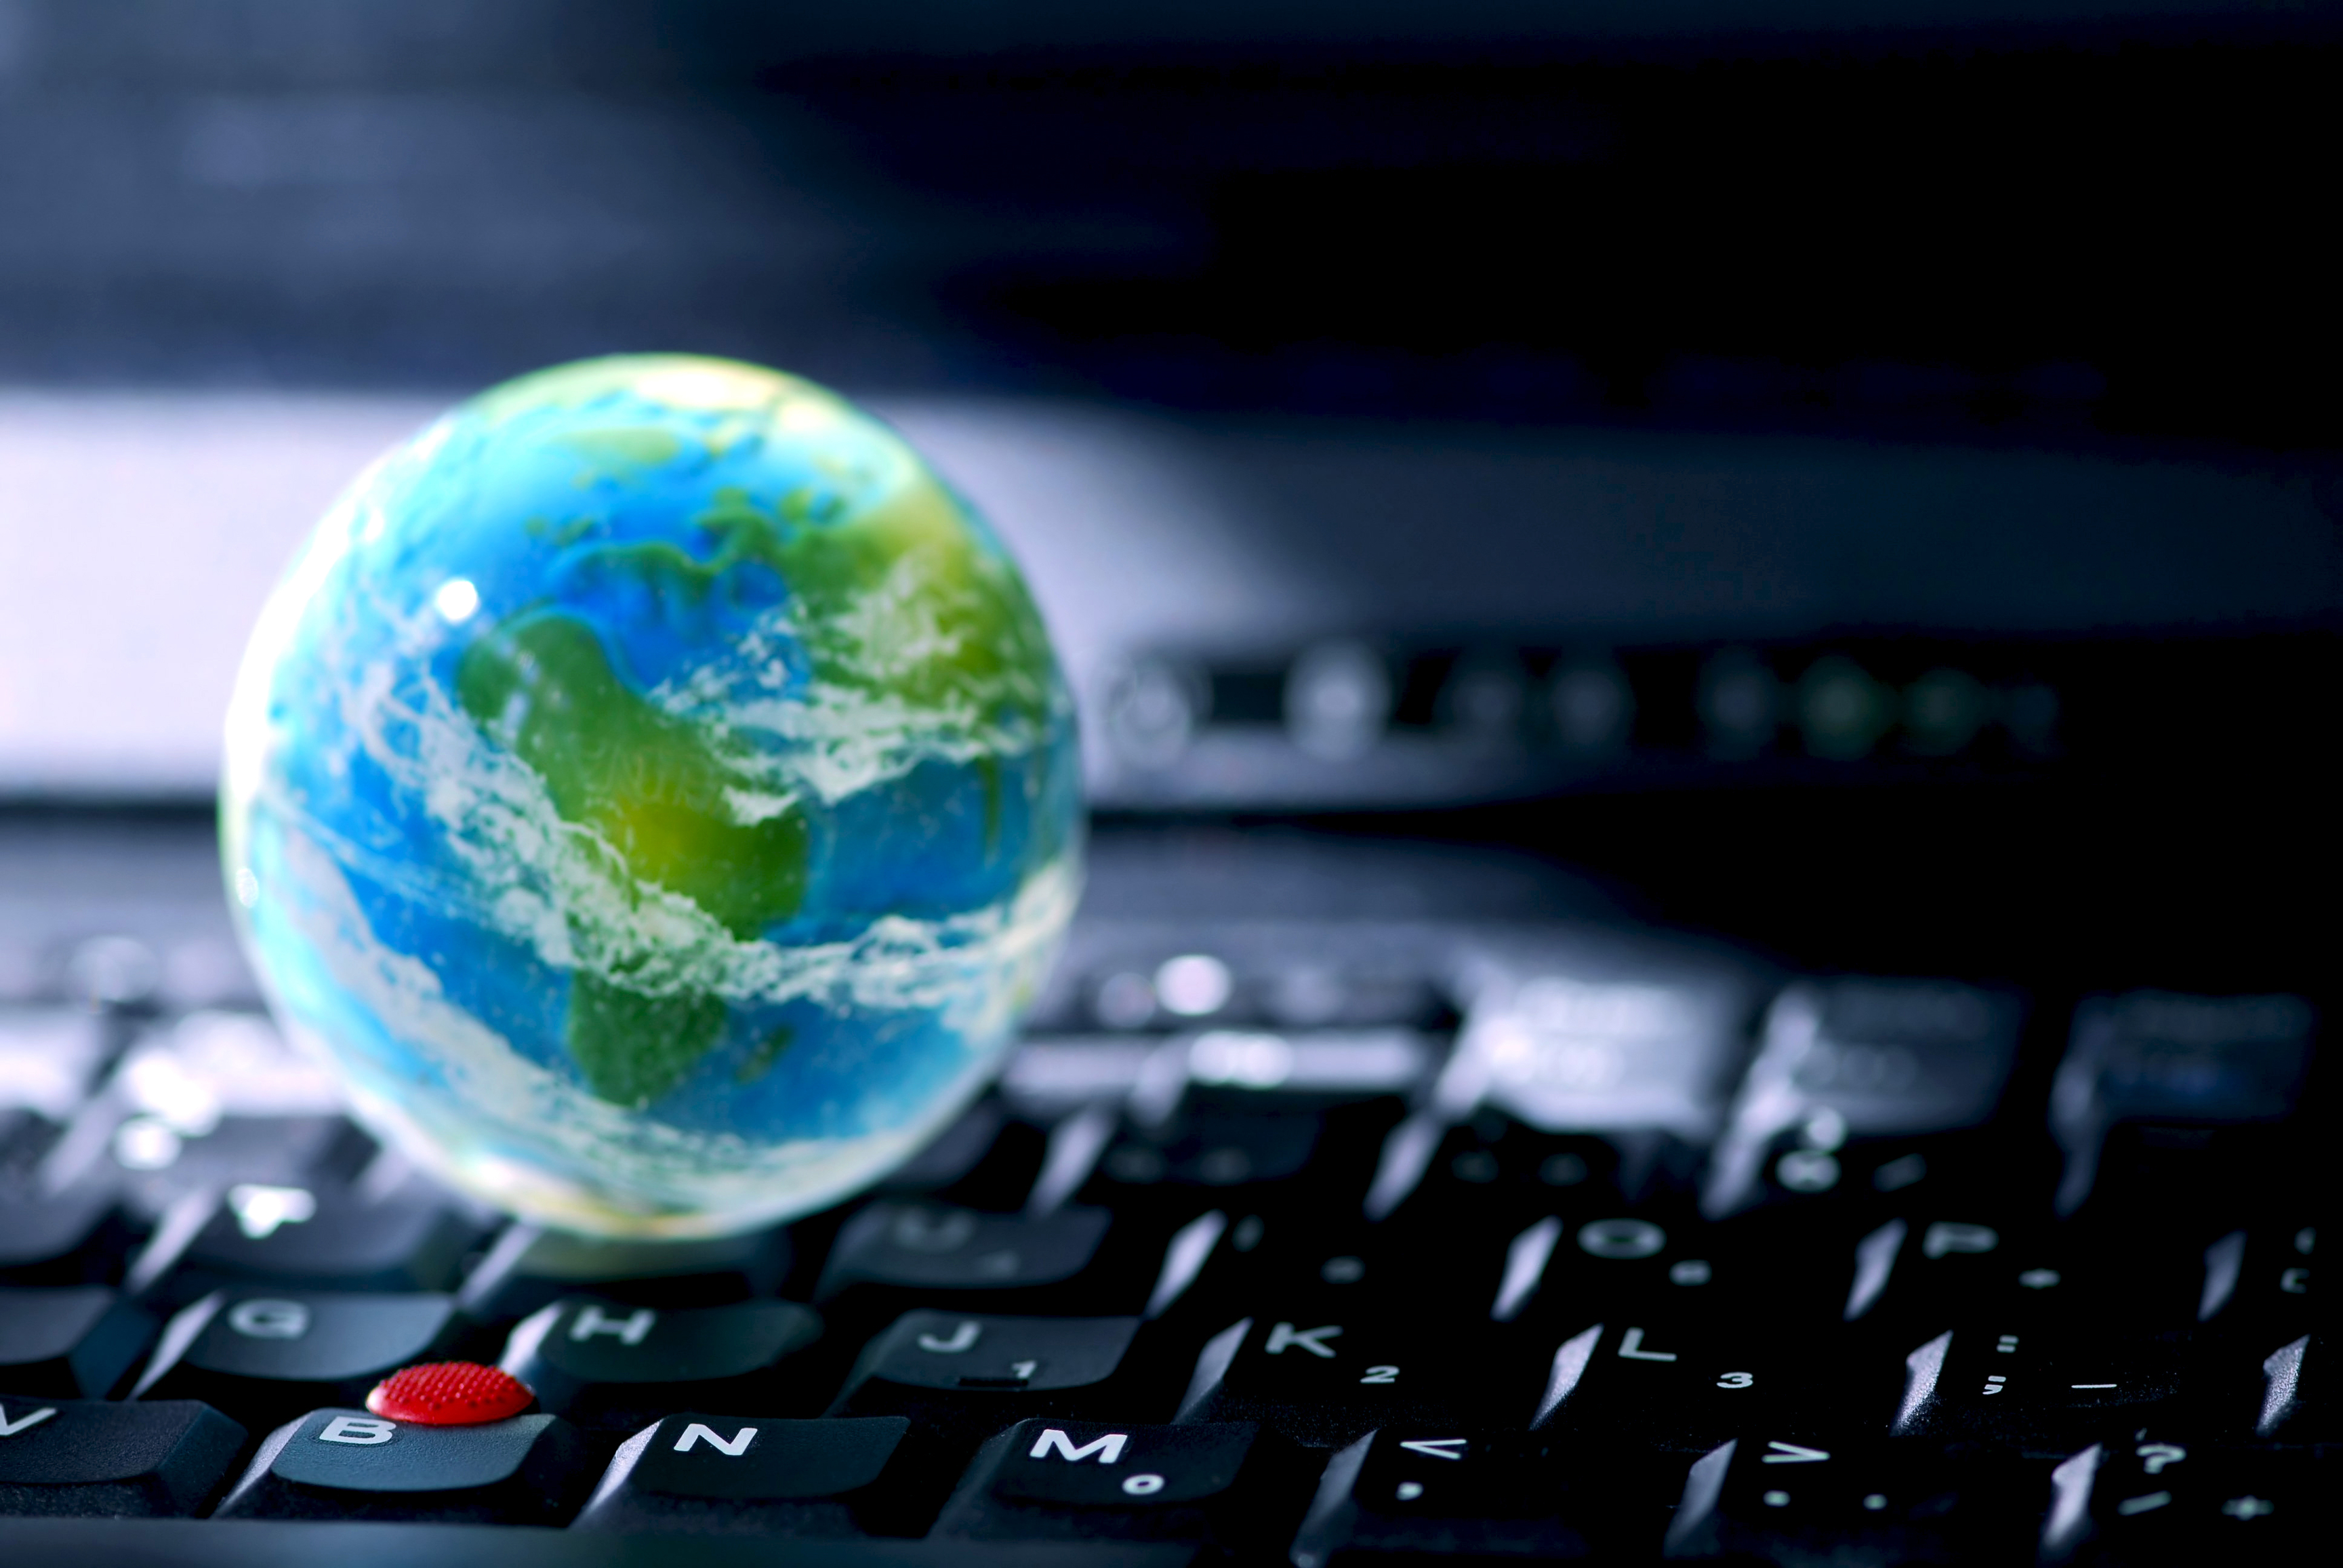 Direct Tv Internet Bundle Satellite Tv Installation Internet Service Provider